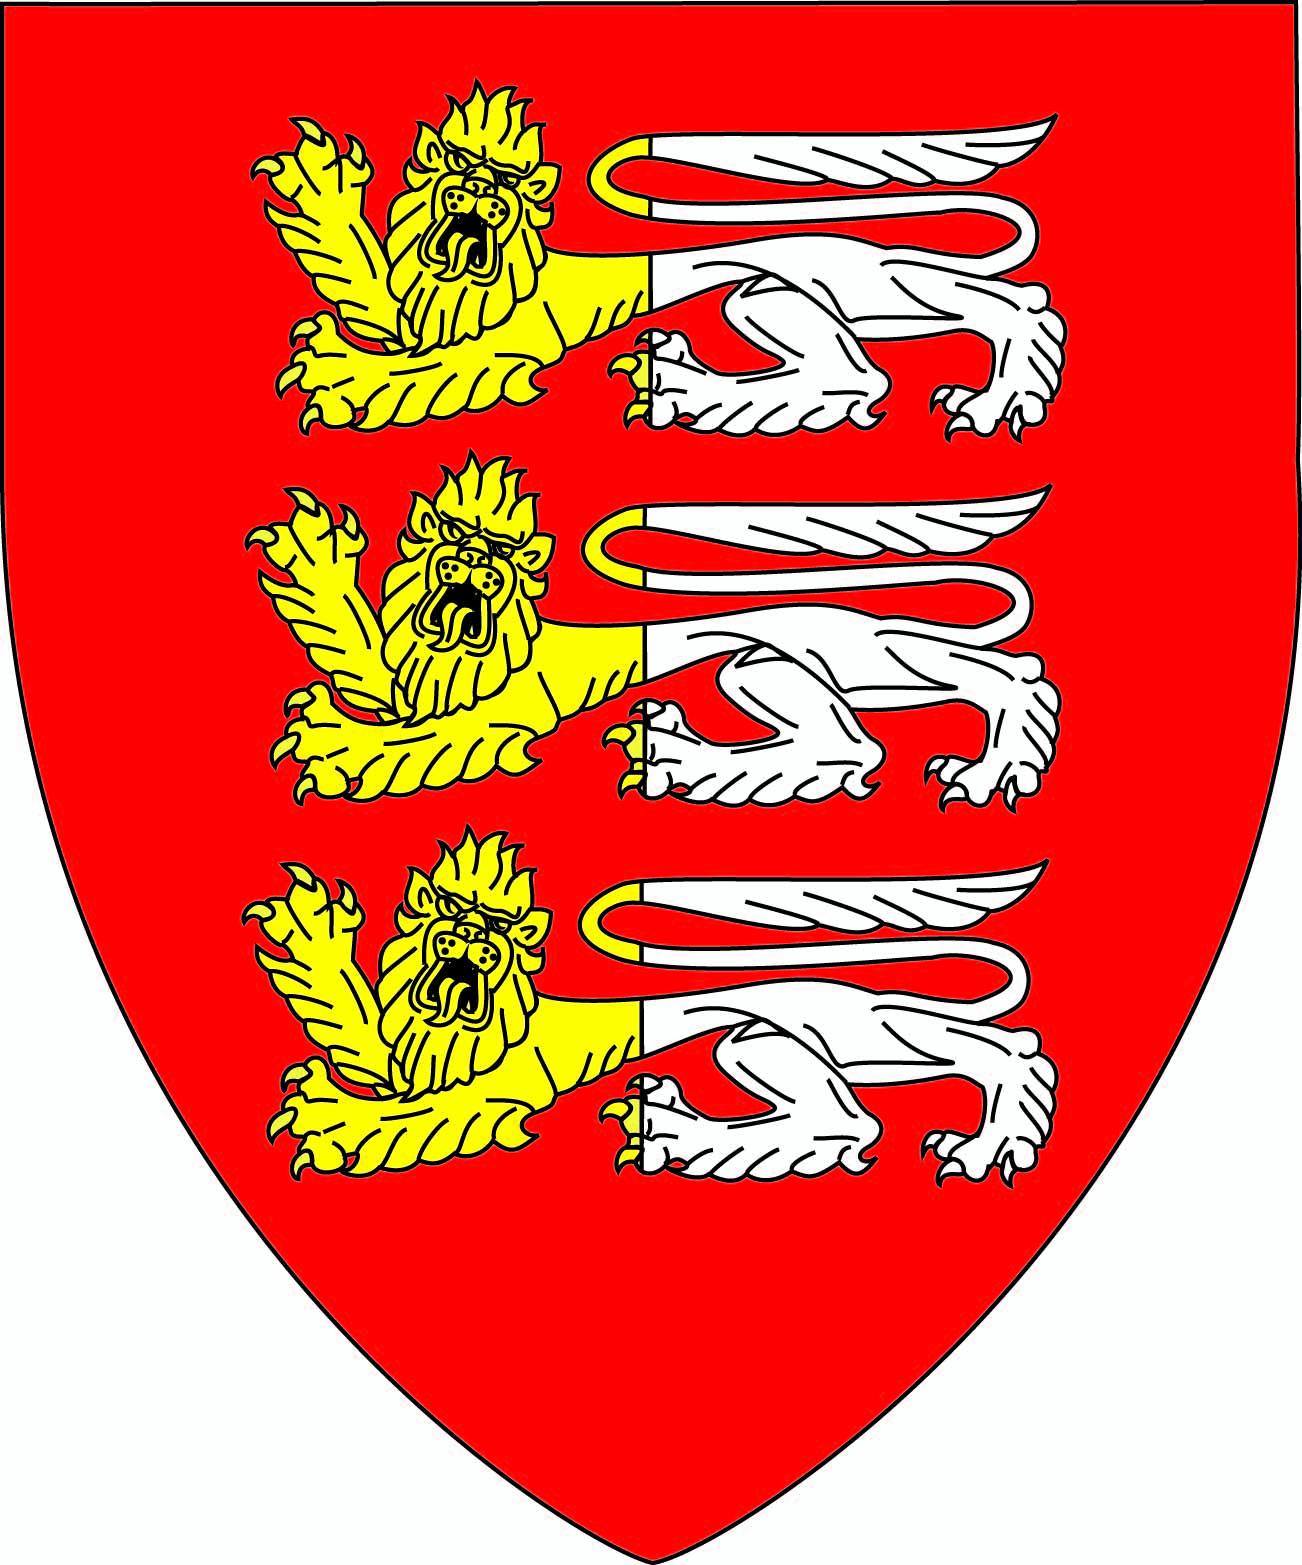 House Of Brian Boru Obrien Clan Heraldry